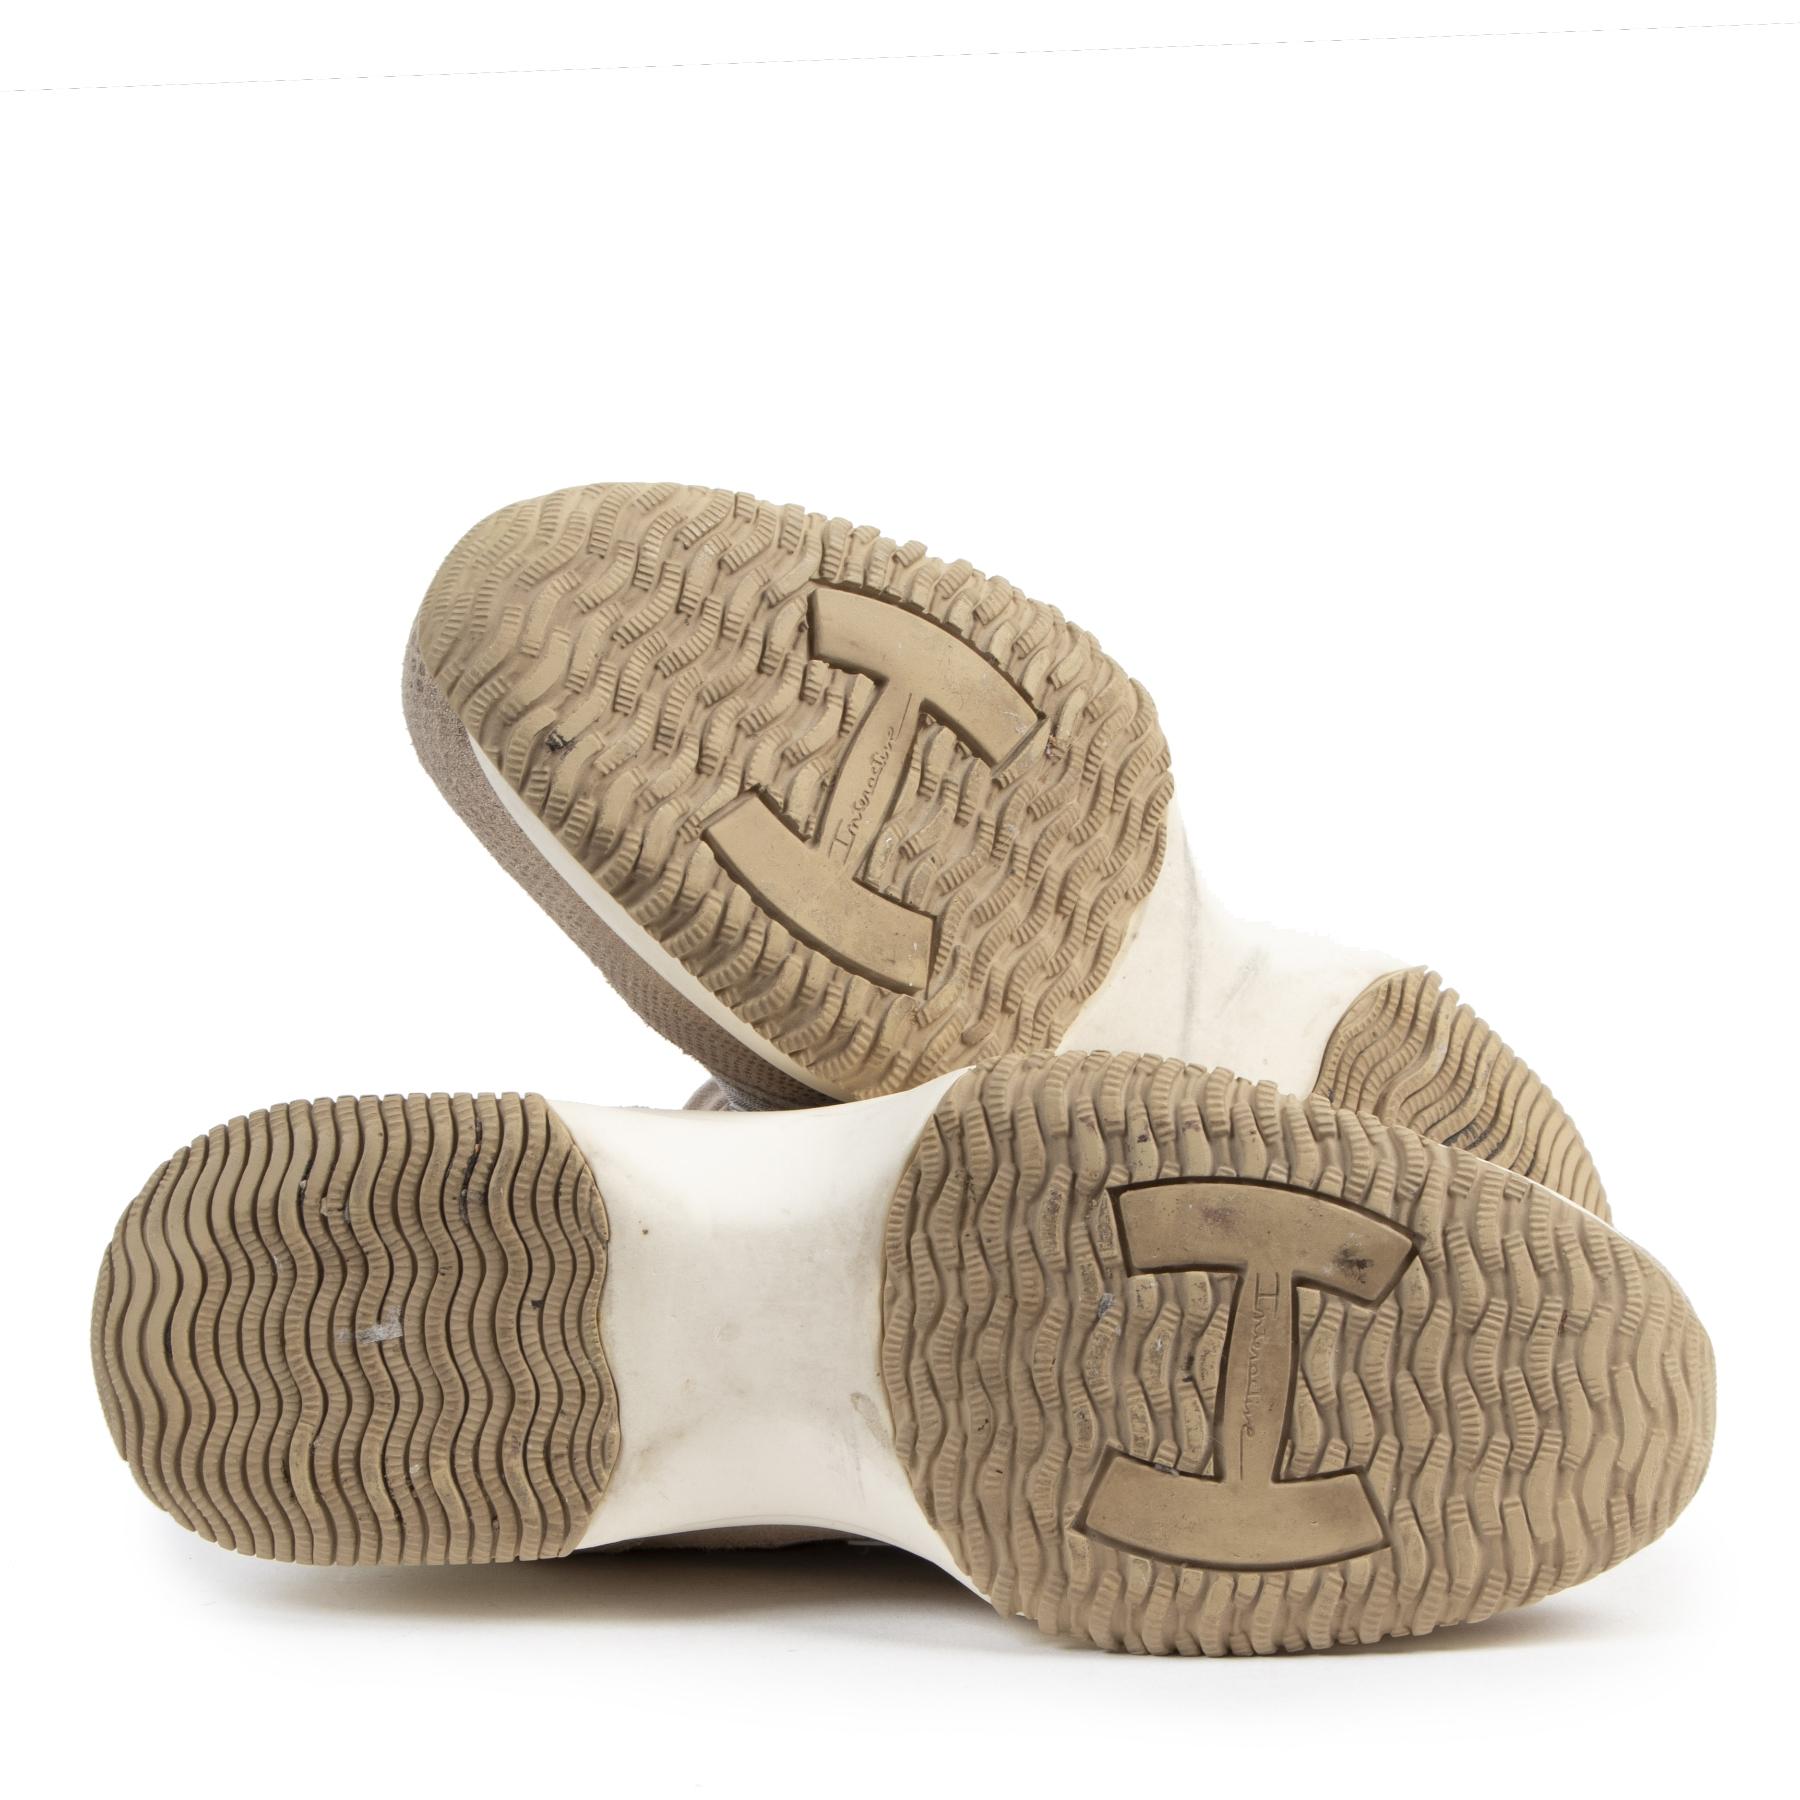 Authentieke tweedehands vintage Hogan Glitter Beige Suede Sneakers - Size 39,5 koop online webshop LabelLOV